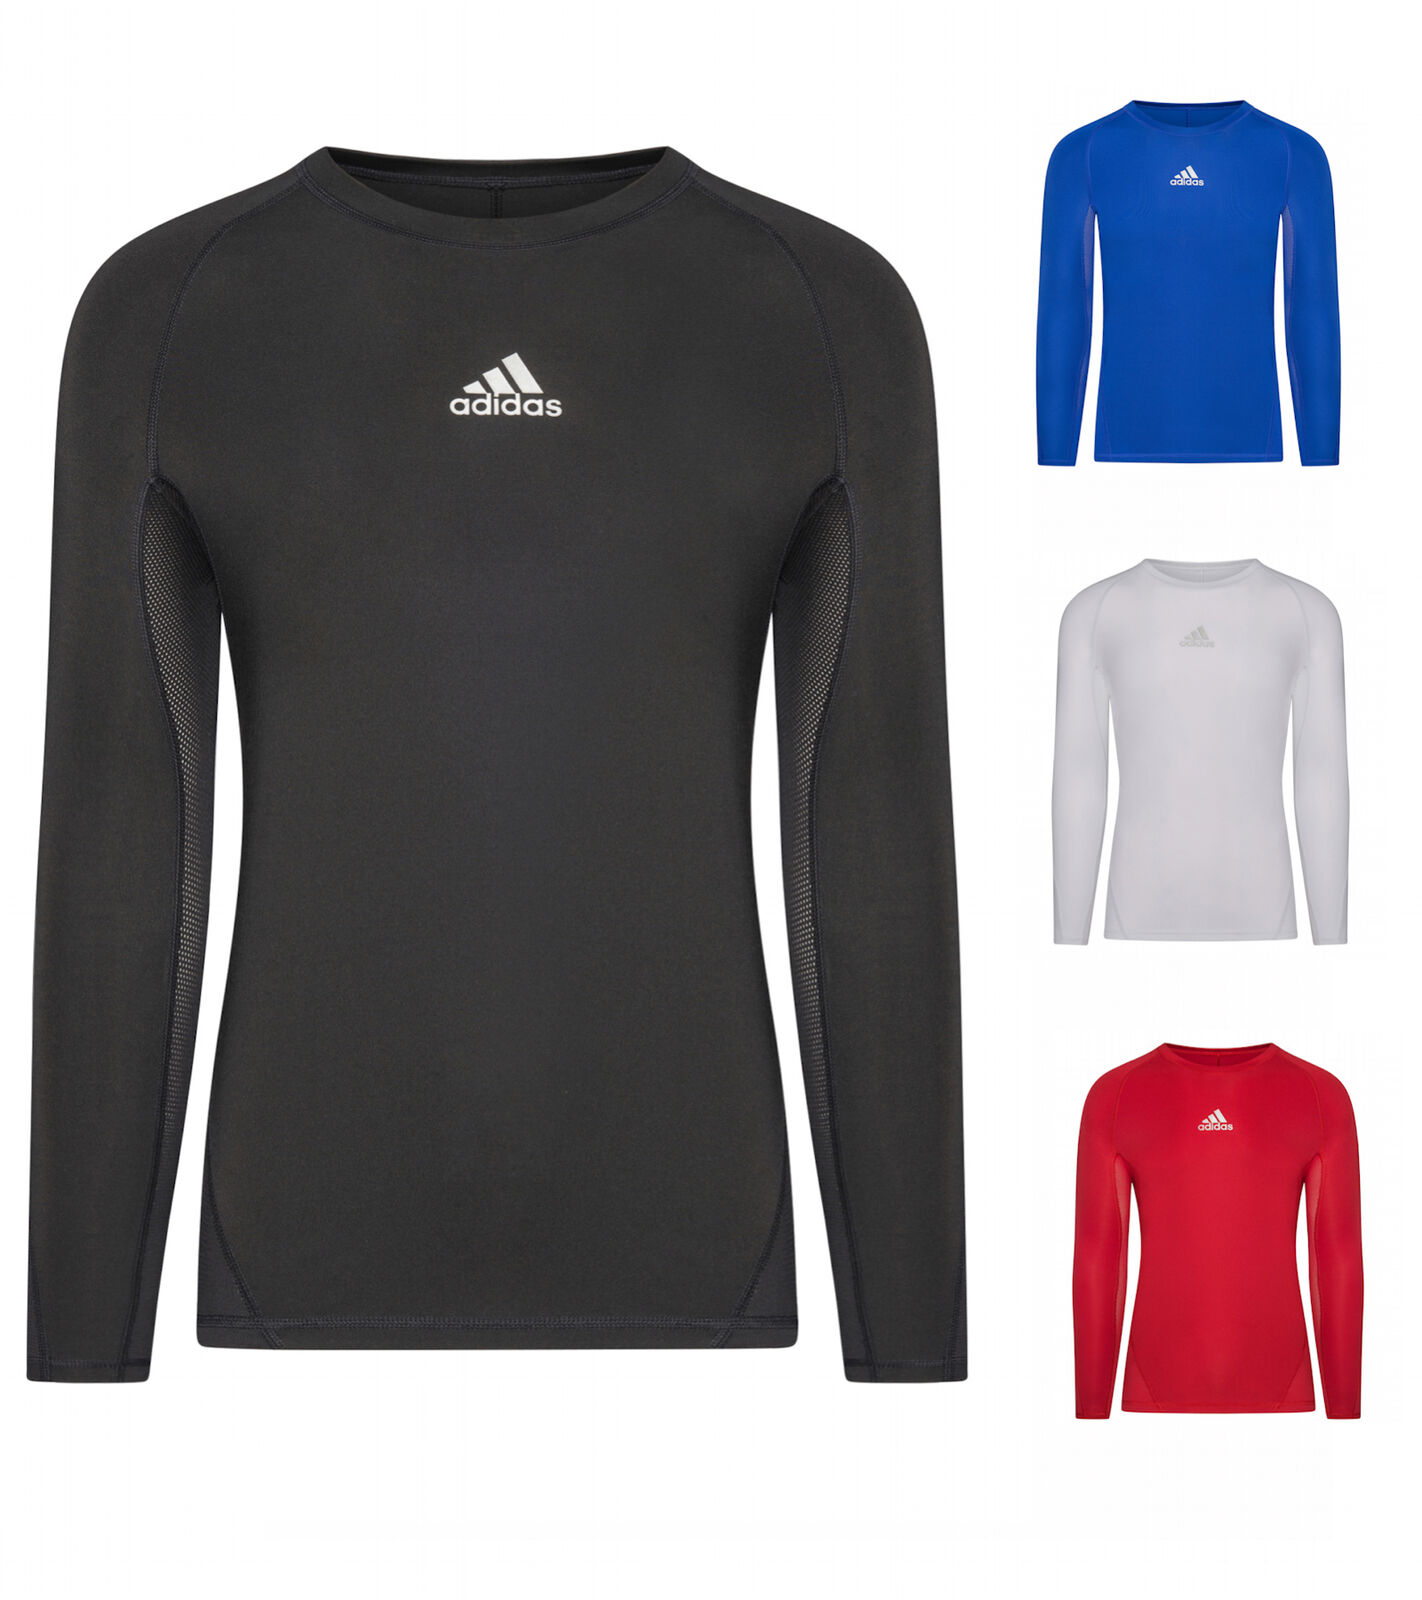 Adidas Herren Alphaskin langarm T-Shirt Sport Fußball Kompression longsleeve